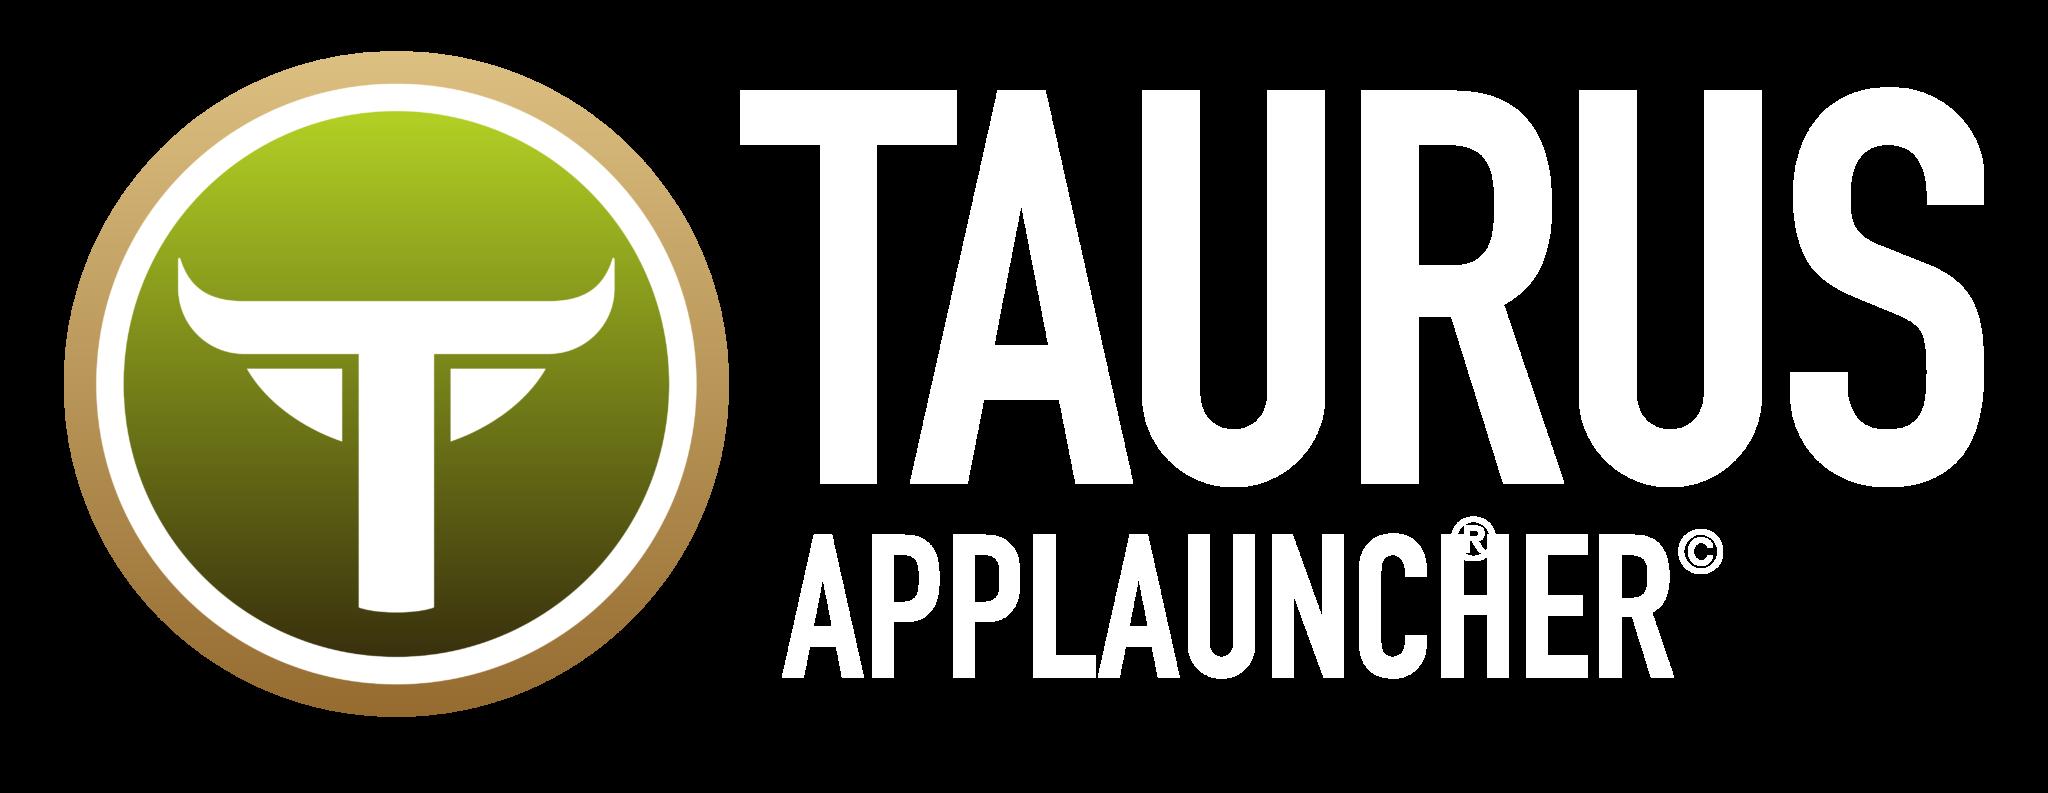 Taurus Marketing logos 53